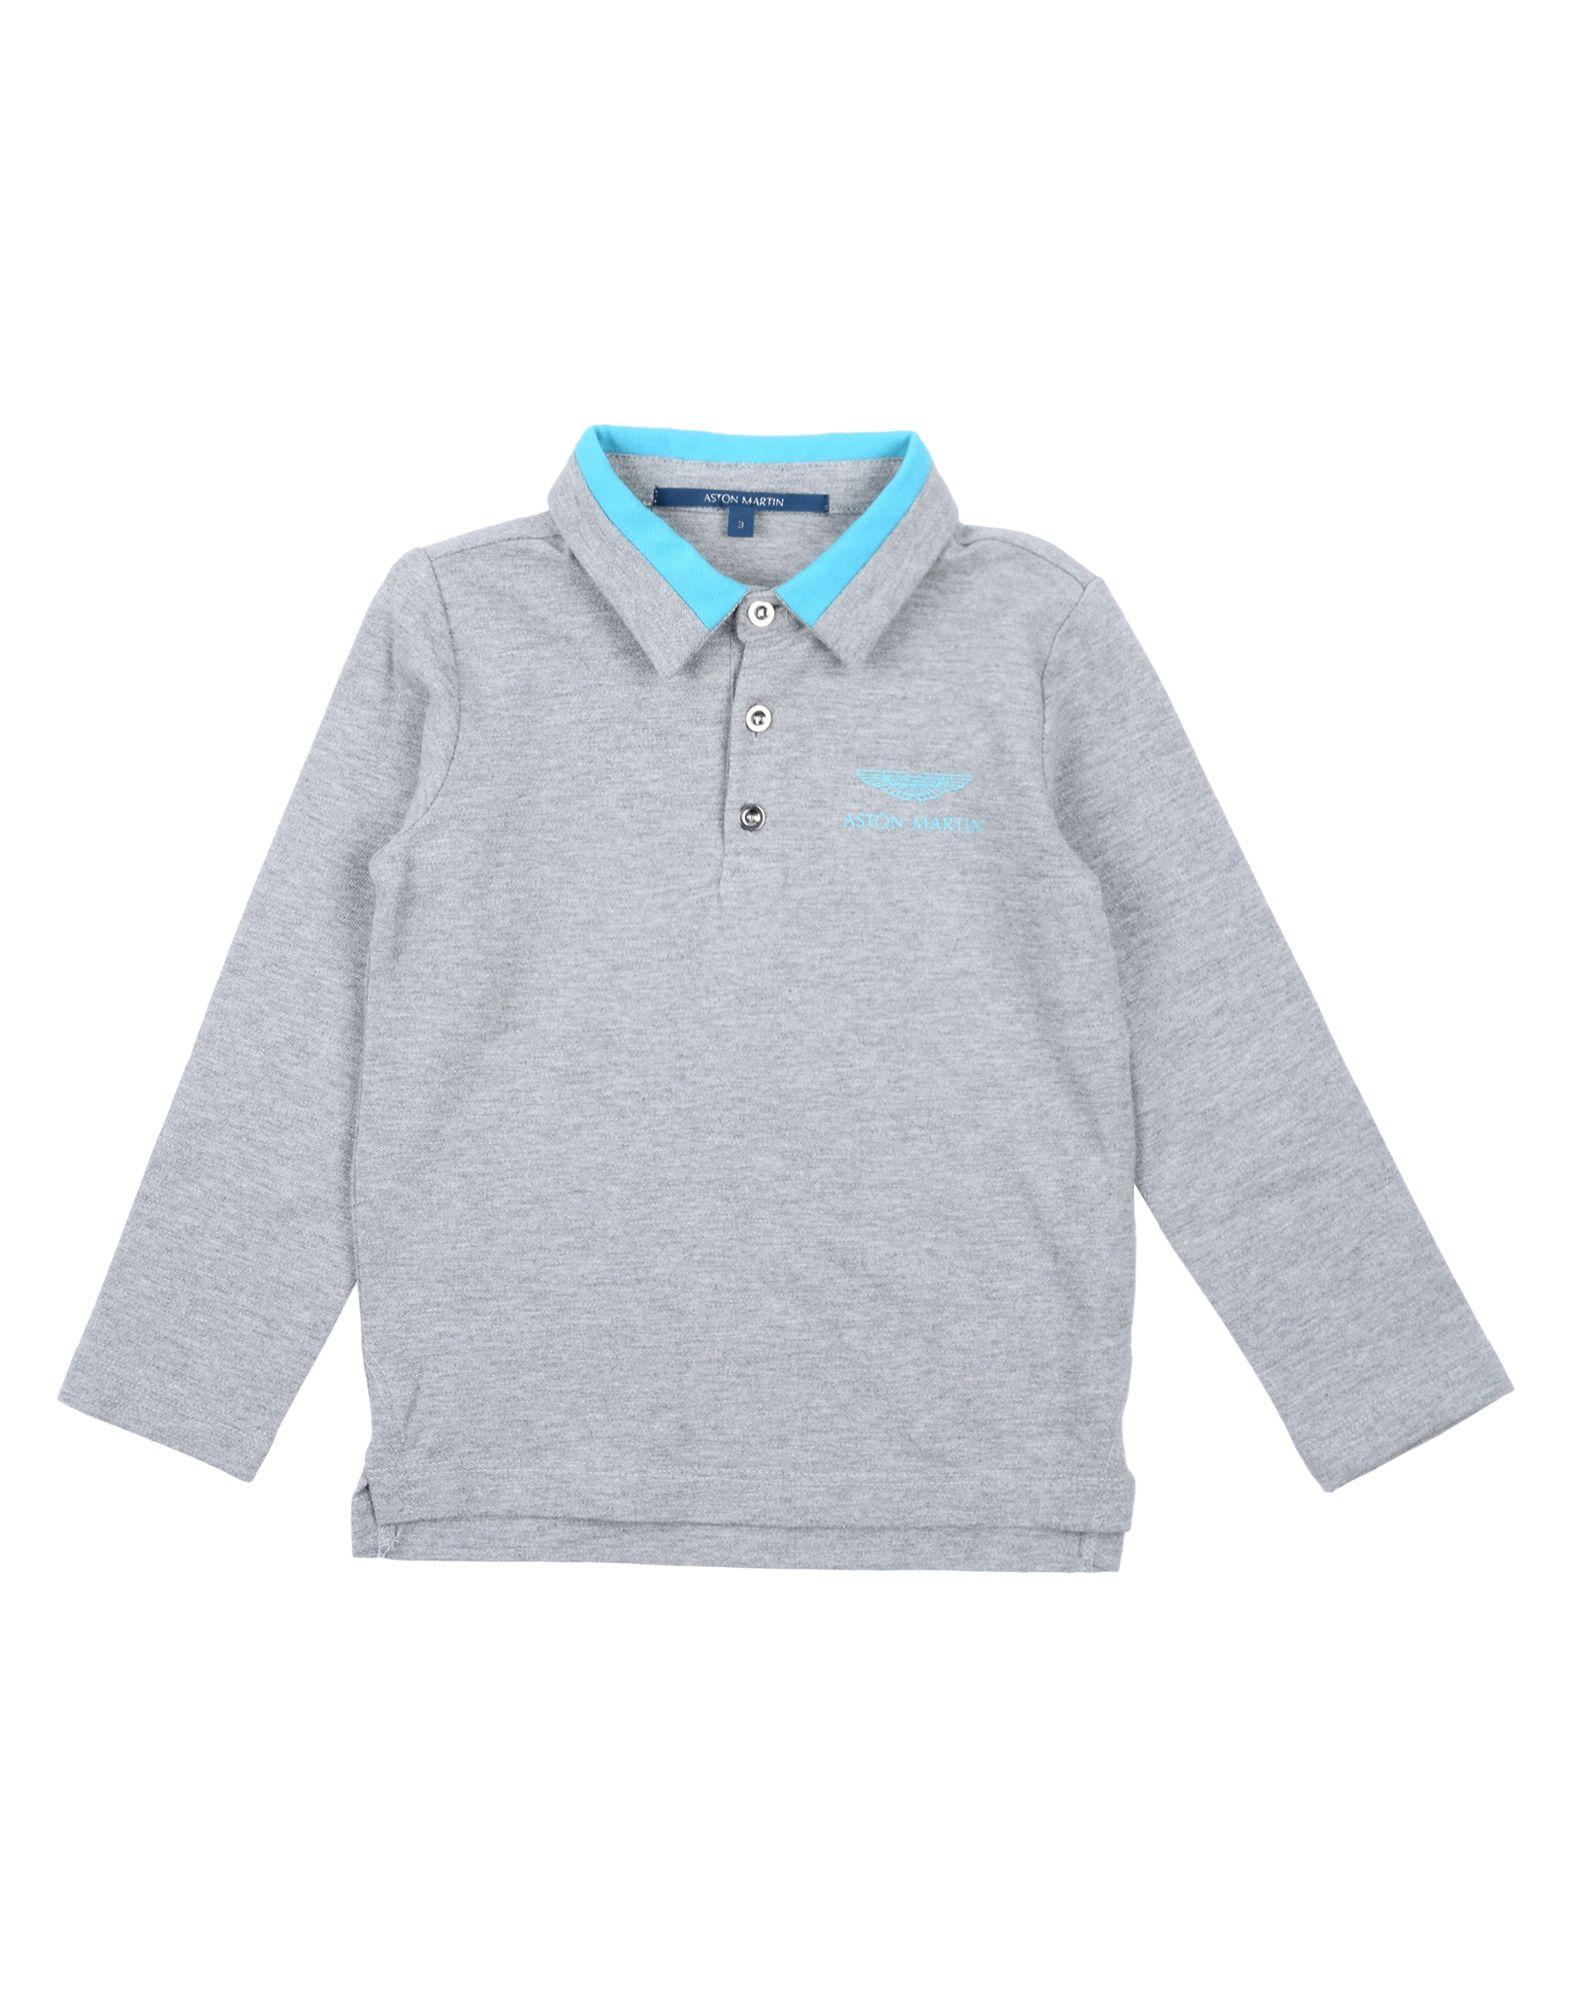 aston martin polo shirt boy 3-8 years online on yoox united states